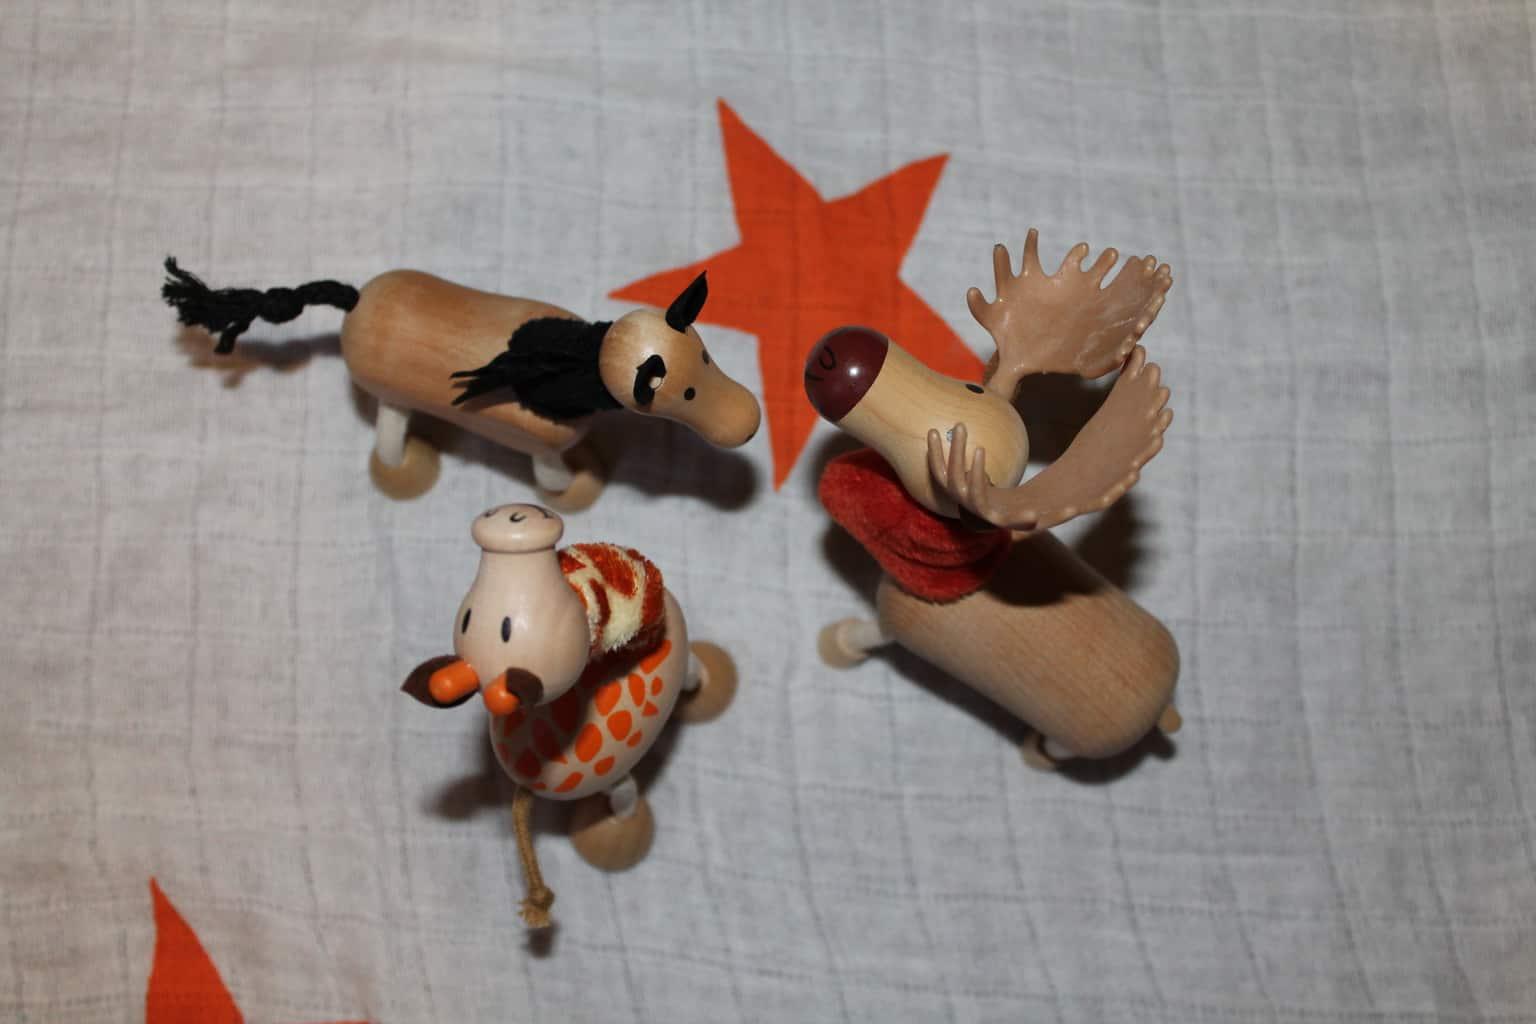 Toddler Loves Anamalz Wooden Toys Scrapbook Blog